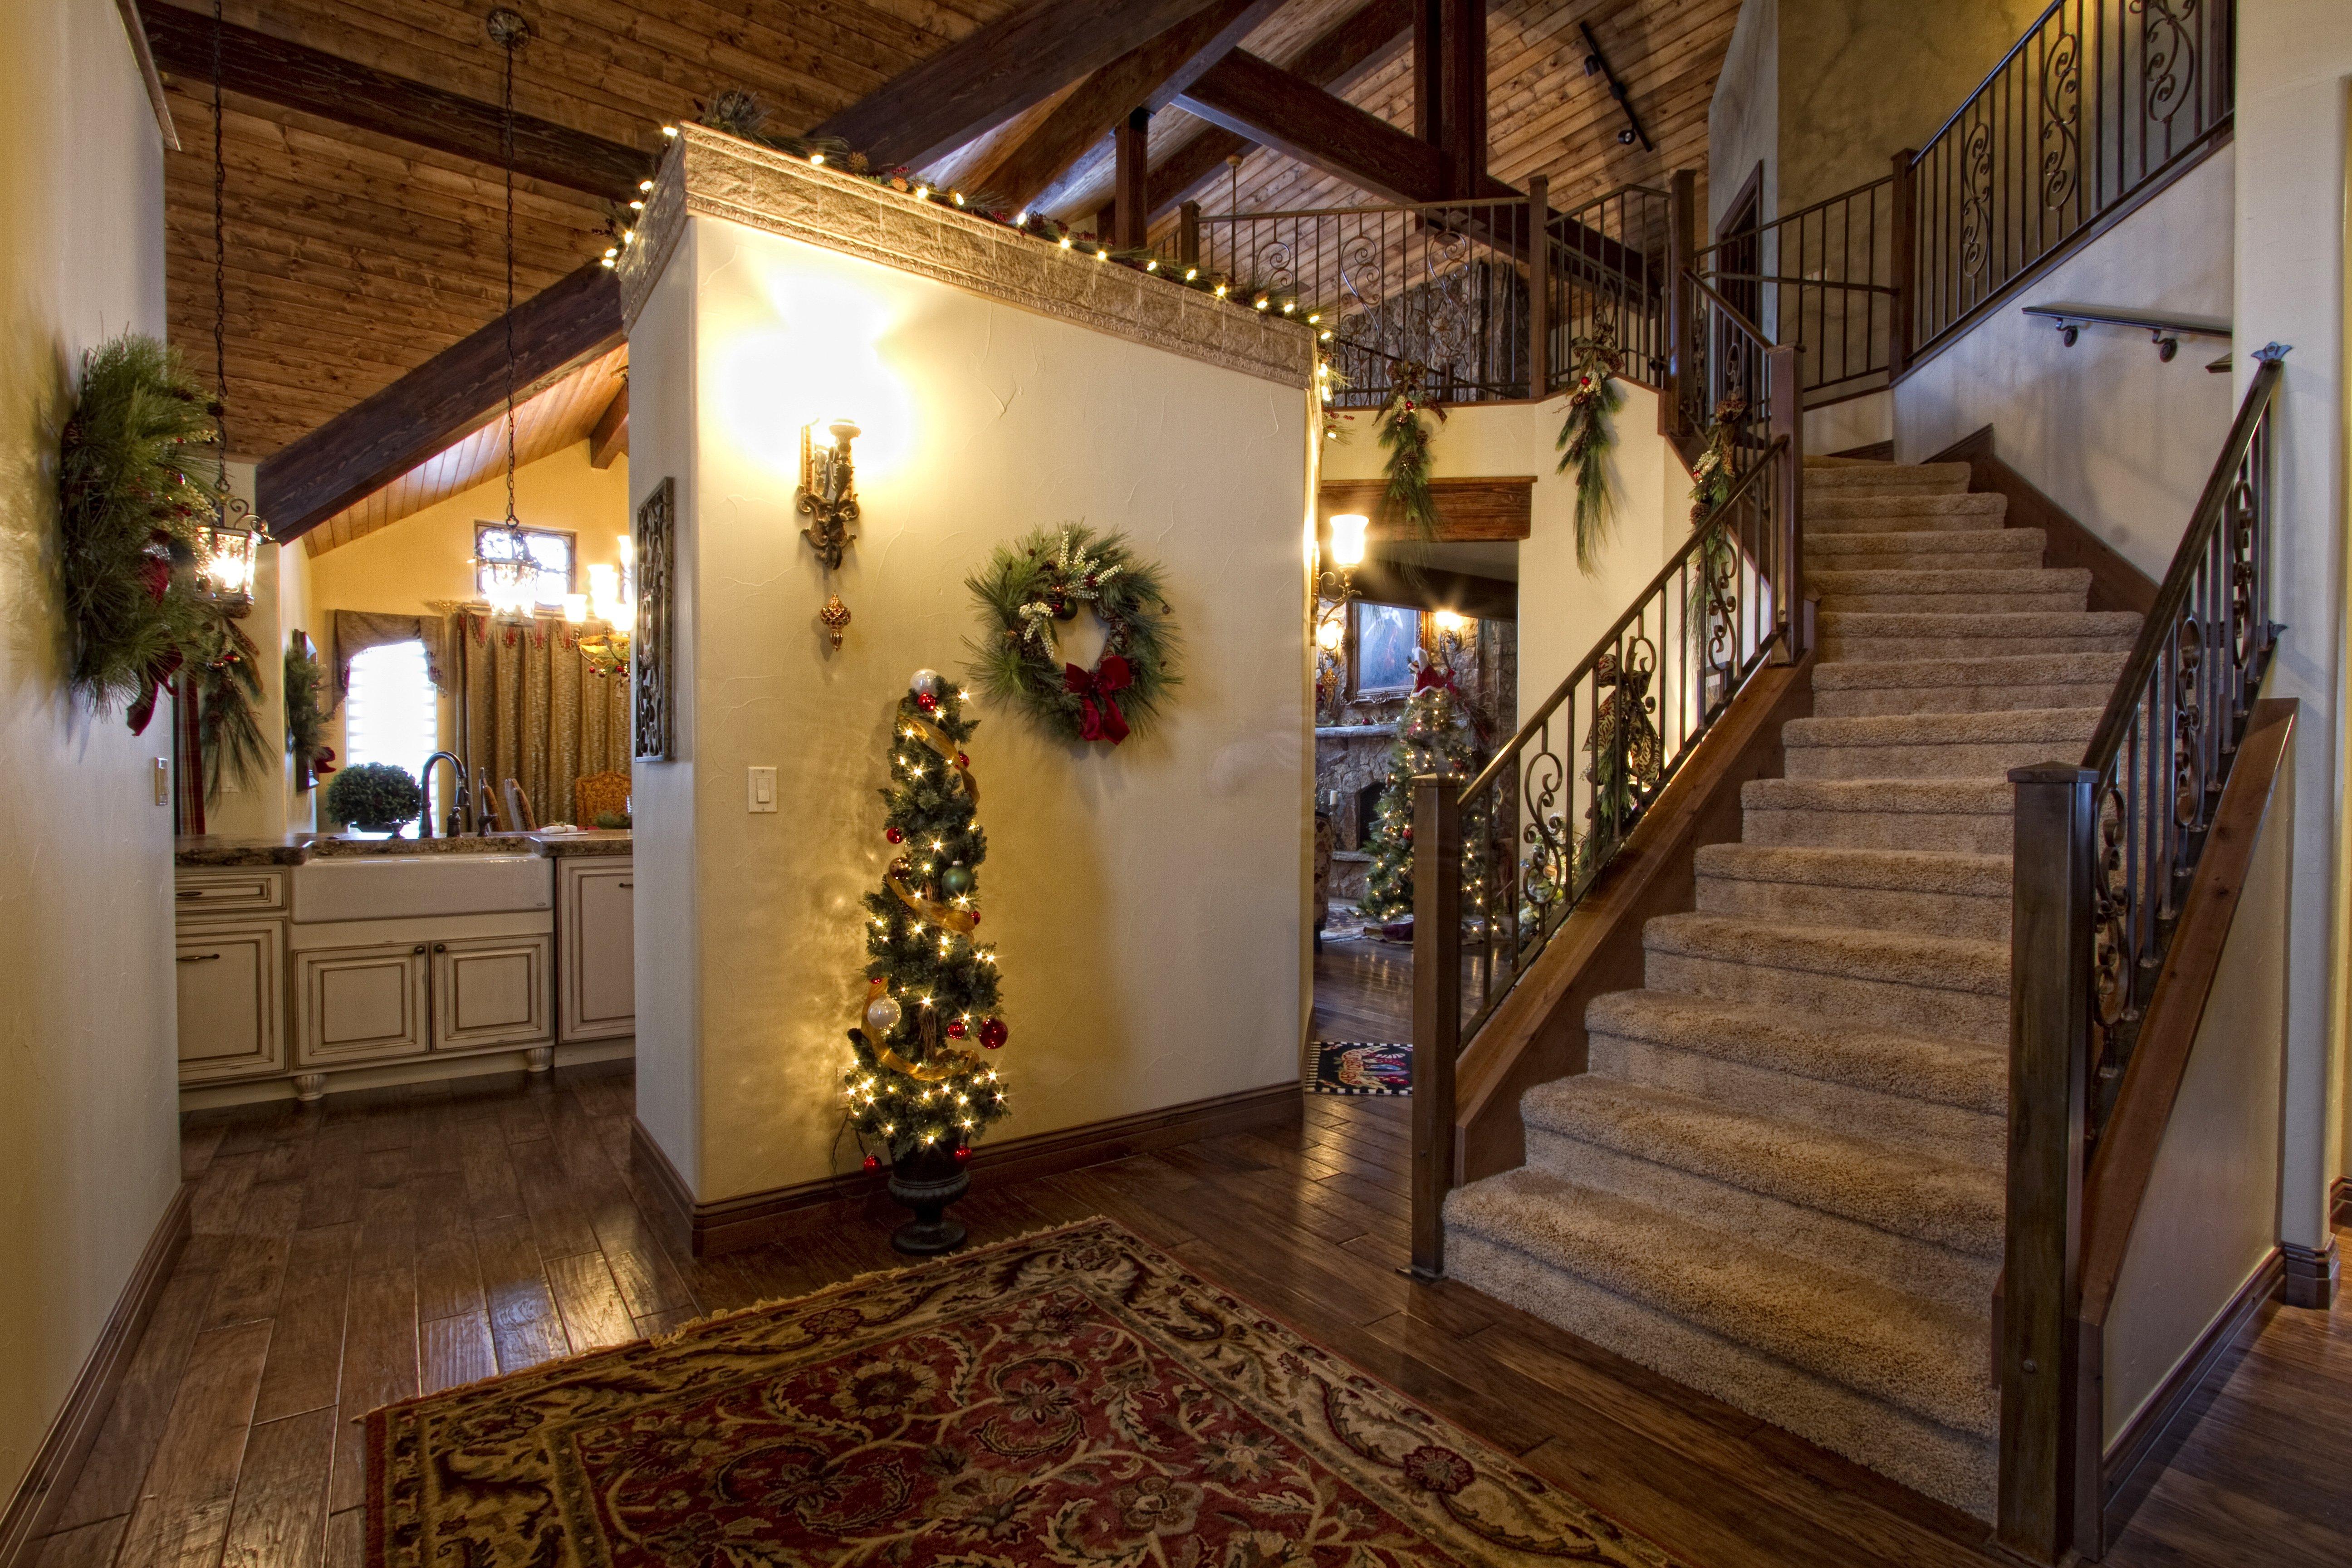 1 - 12 December